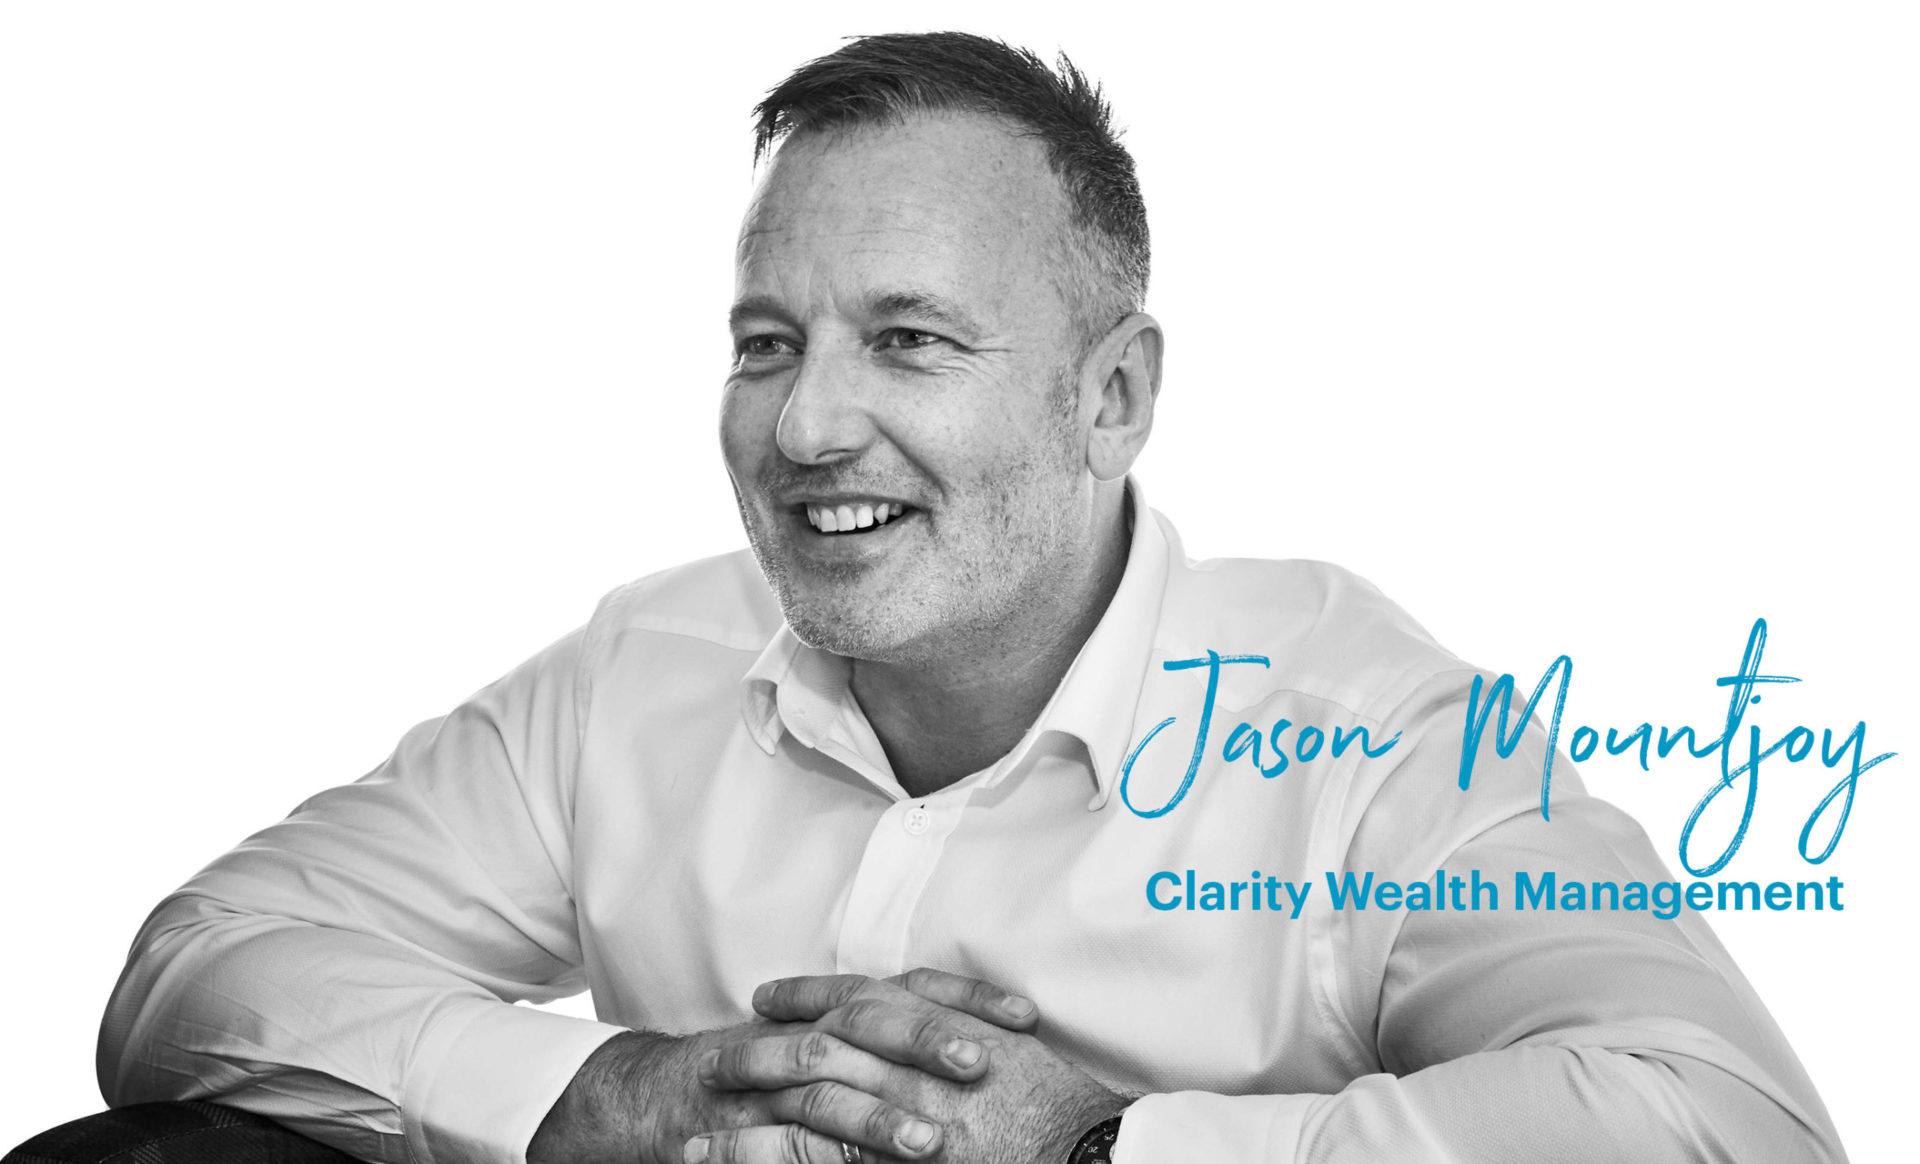 Jason Mountjoy of Clarity Wealth Management